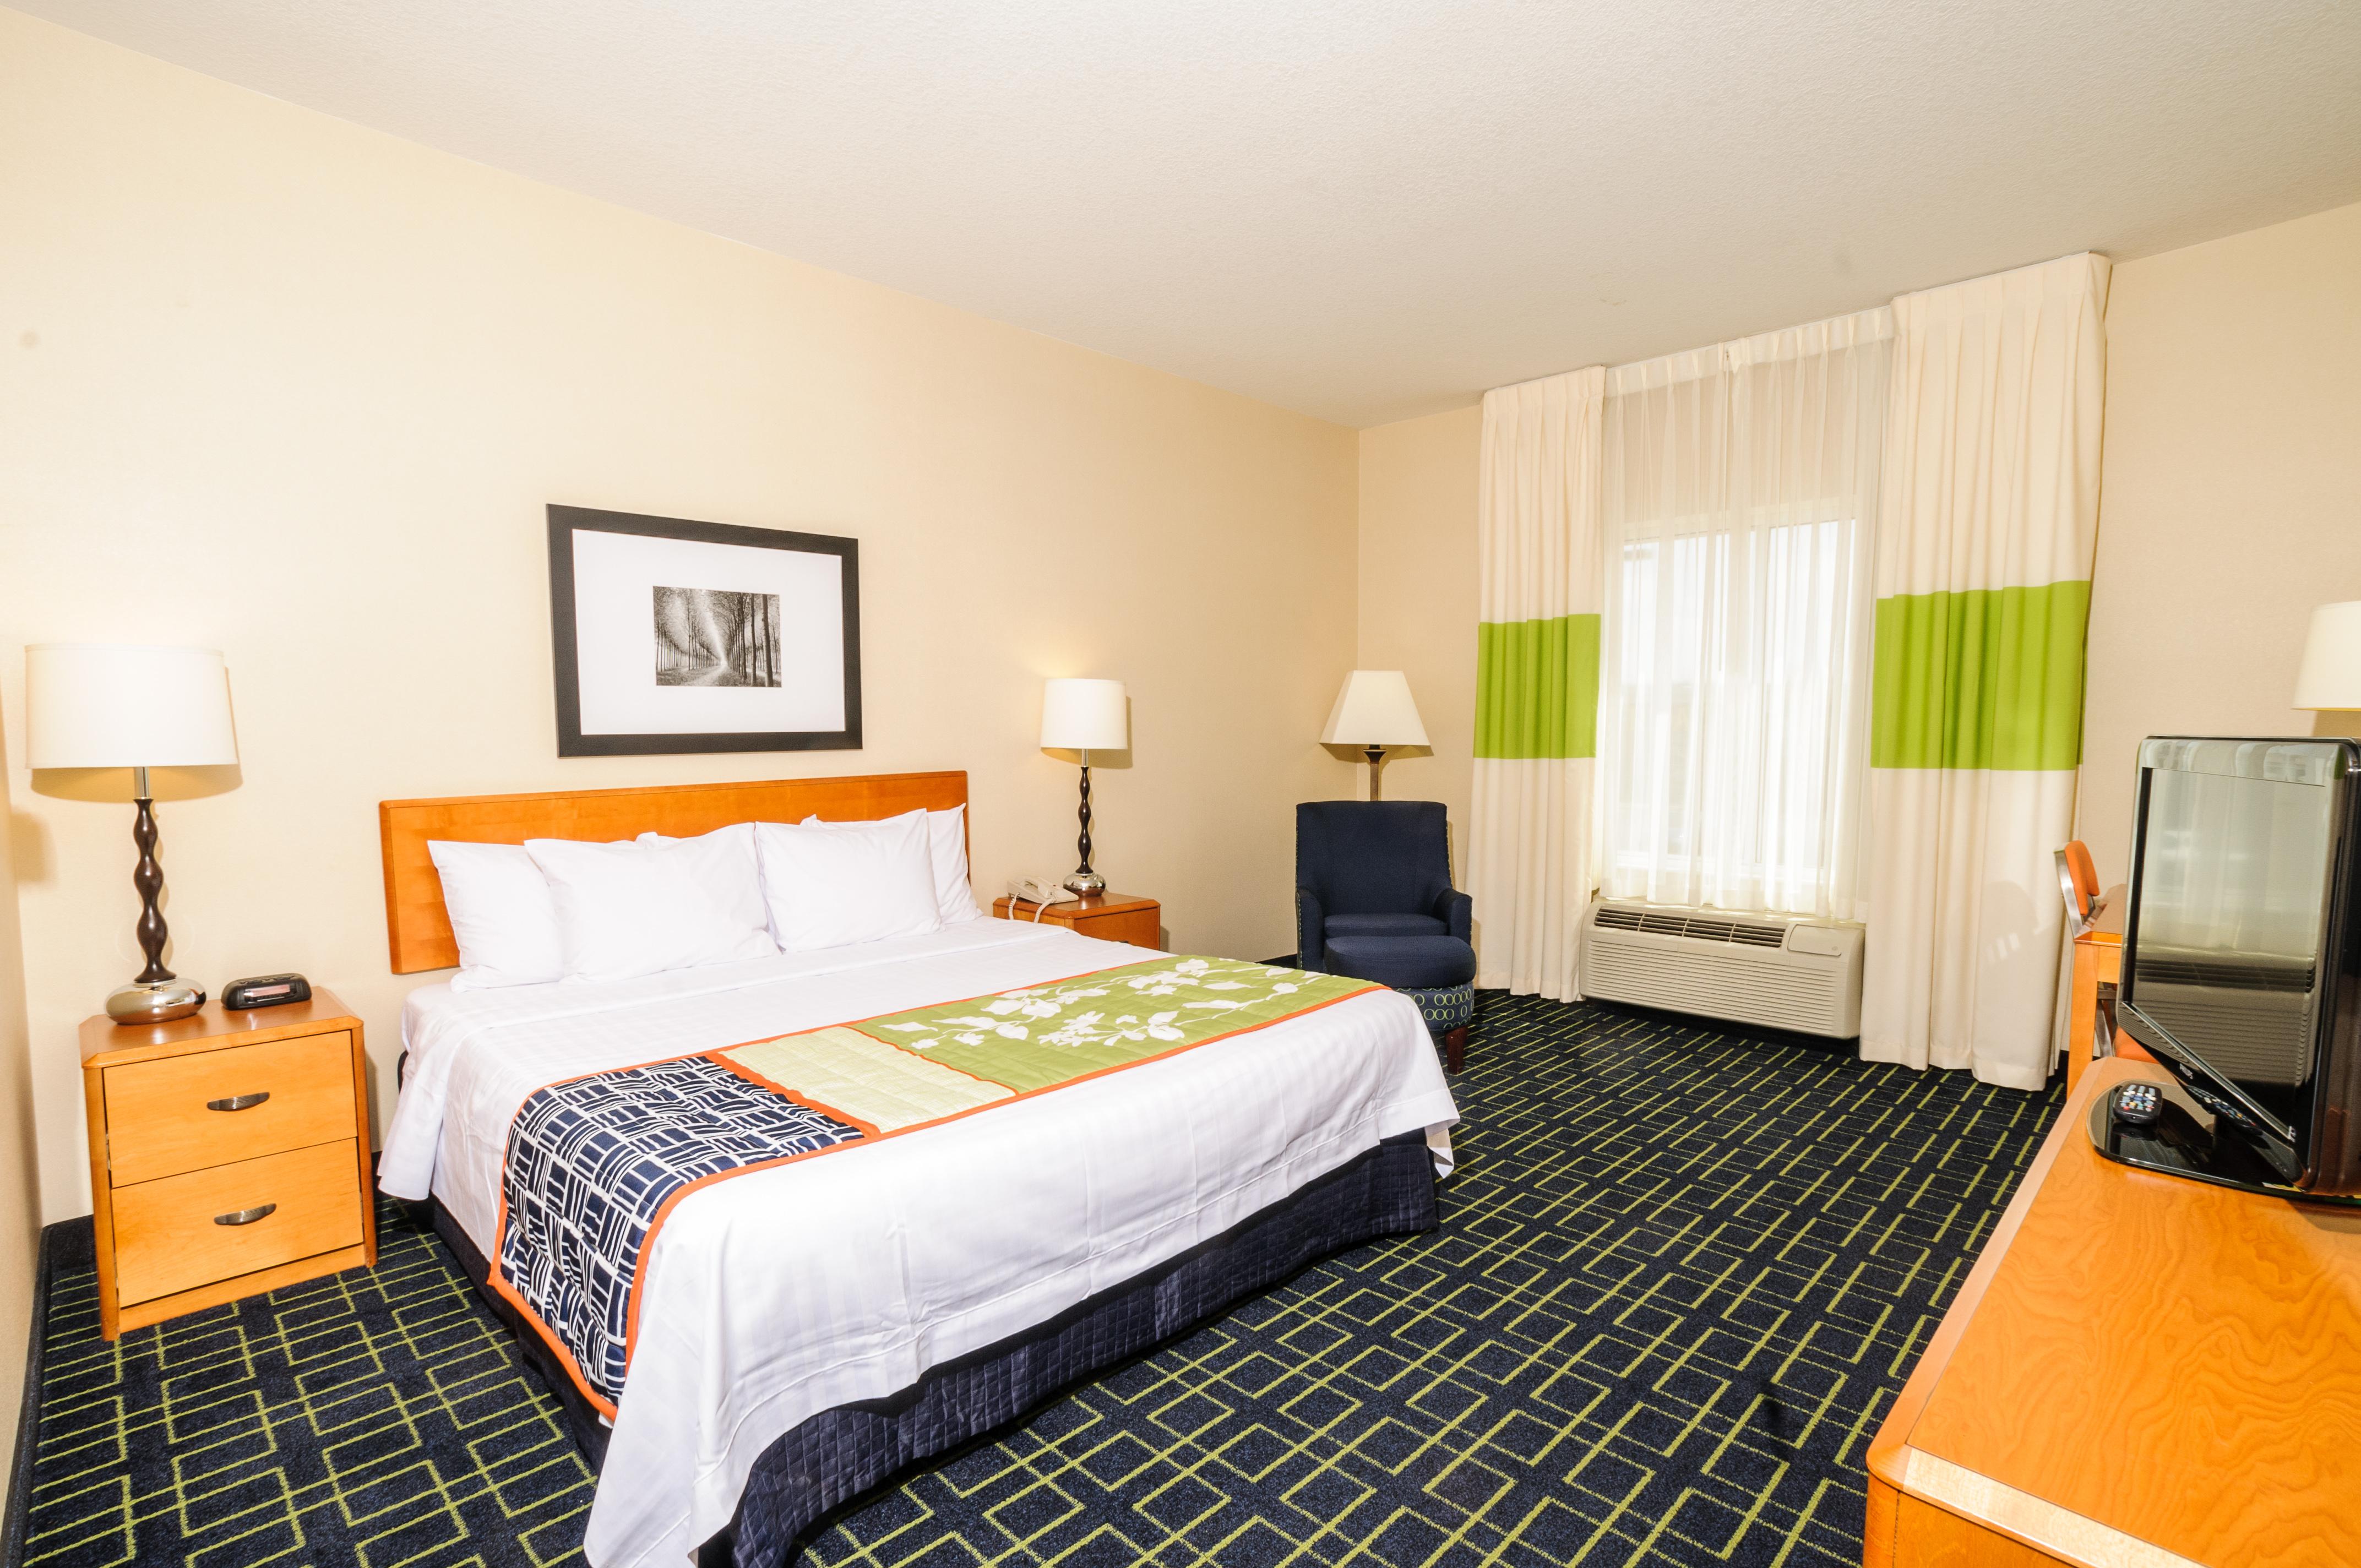 Fairfield Inn & Suites by Marriott Akron South image 18